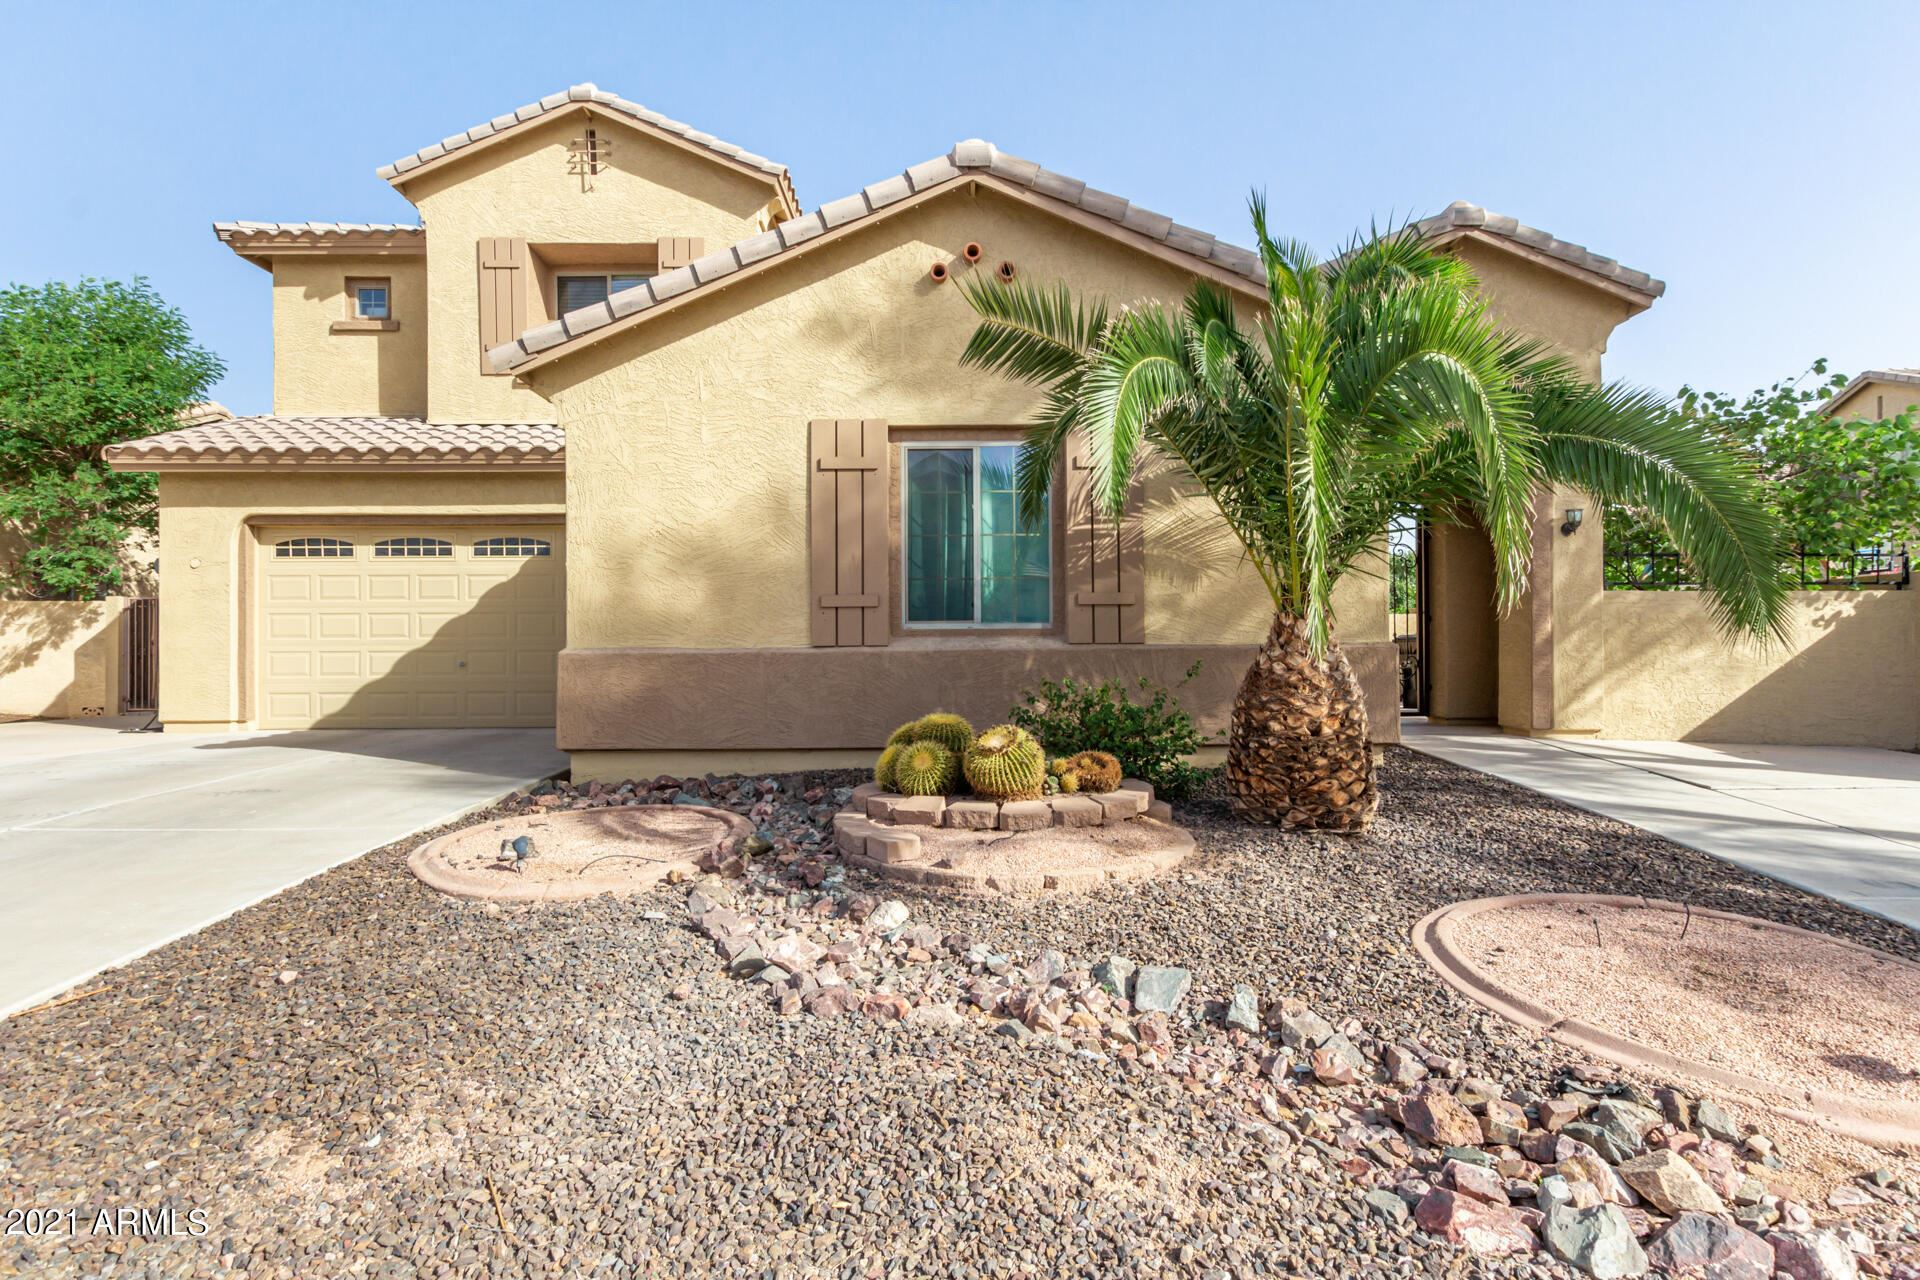 Photo of 13250 W MONTEREY Way, Litchfield Park, AZ 85340 (MLS # 6306563)